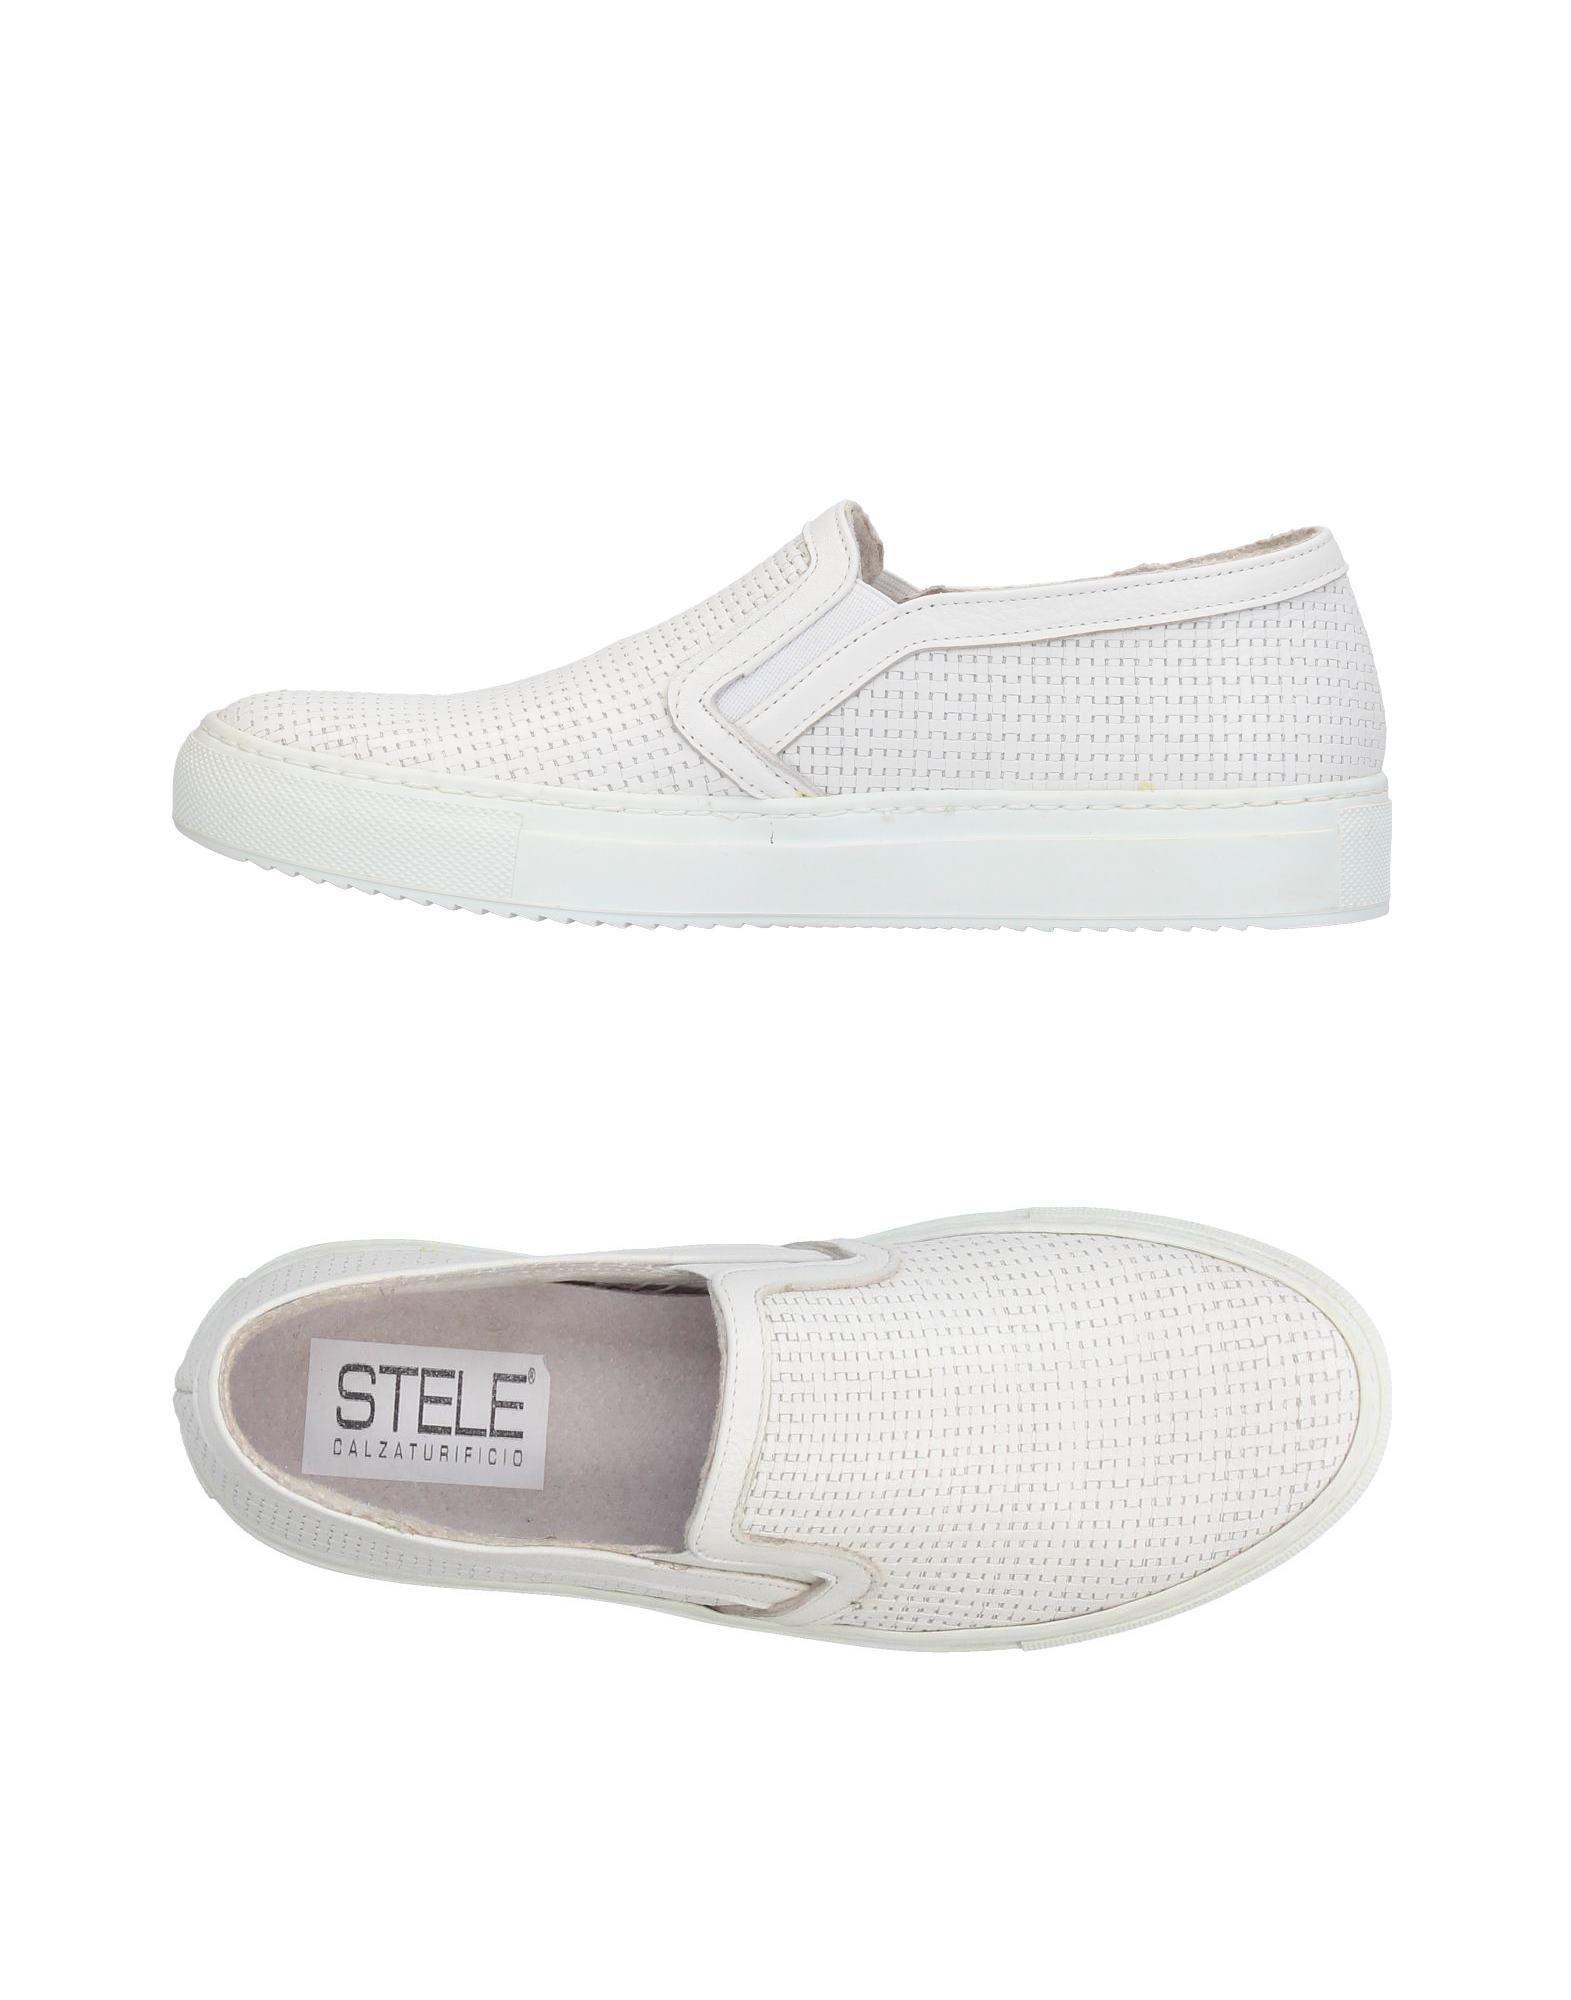 FOOTWEAR - Low-tops & sneakers Stele 8xG4Q